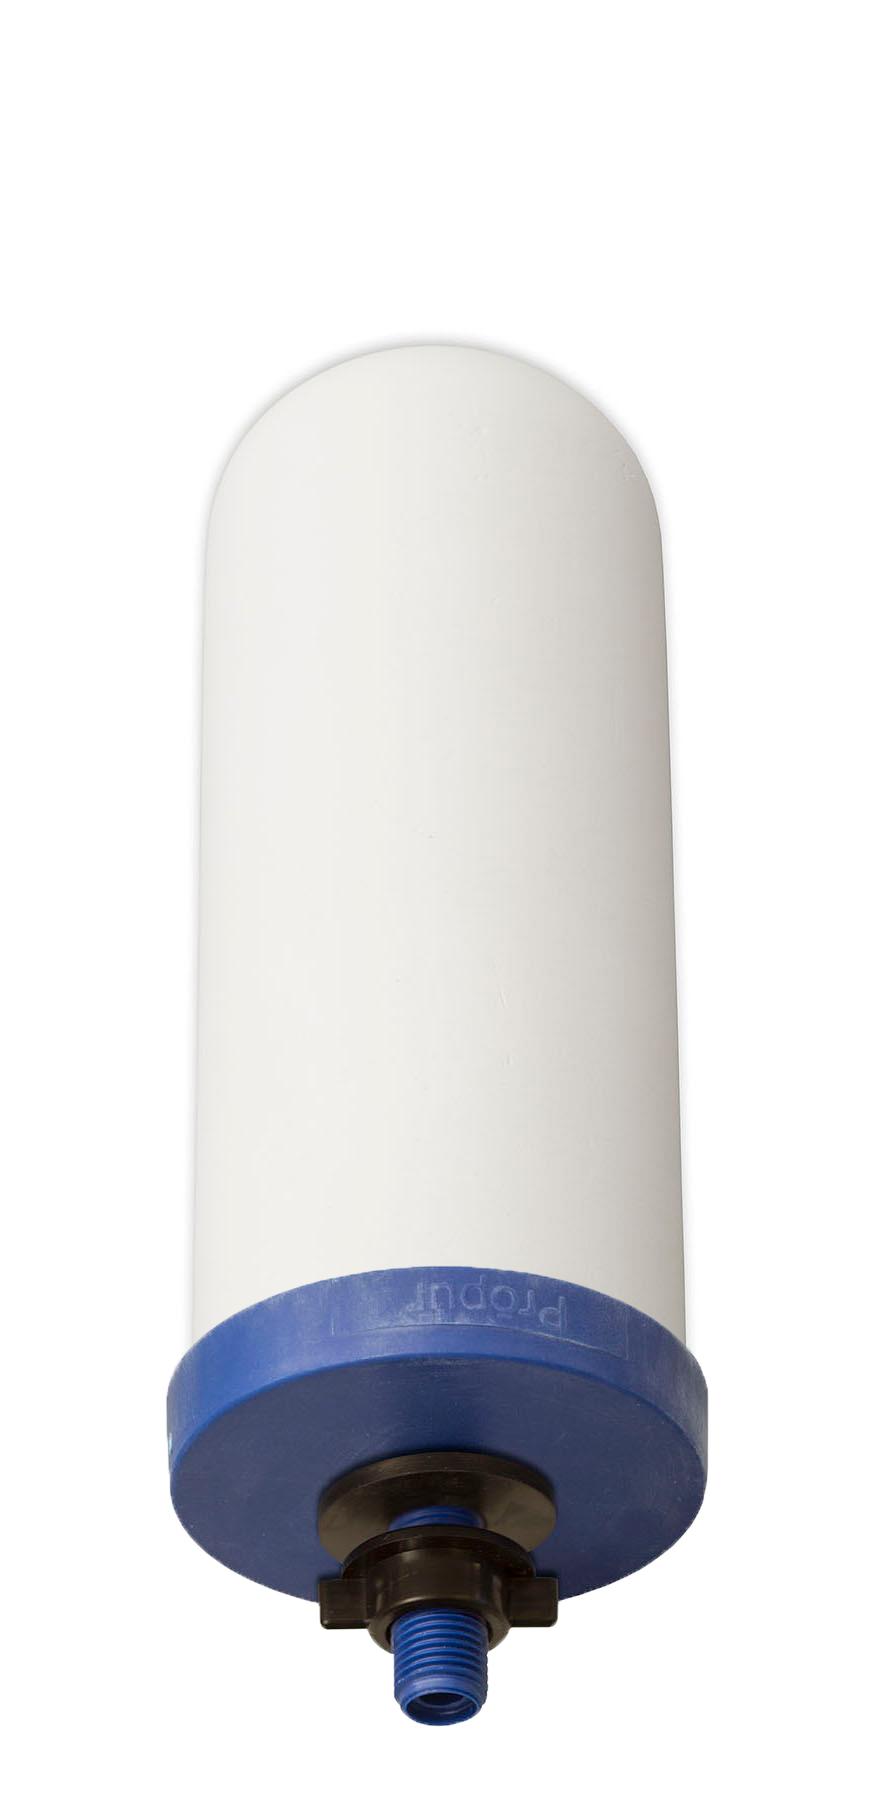 "ProOne® G2.0 5/"" SLIMLINE Filter Element"